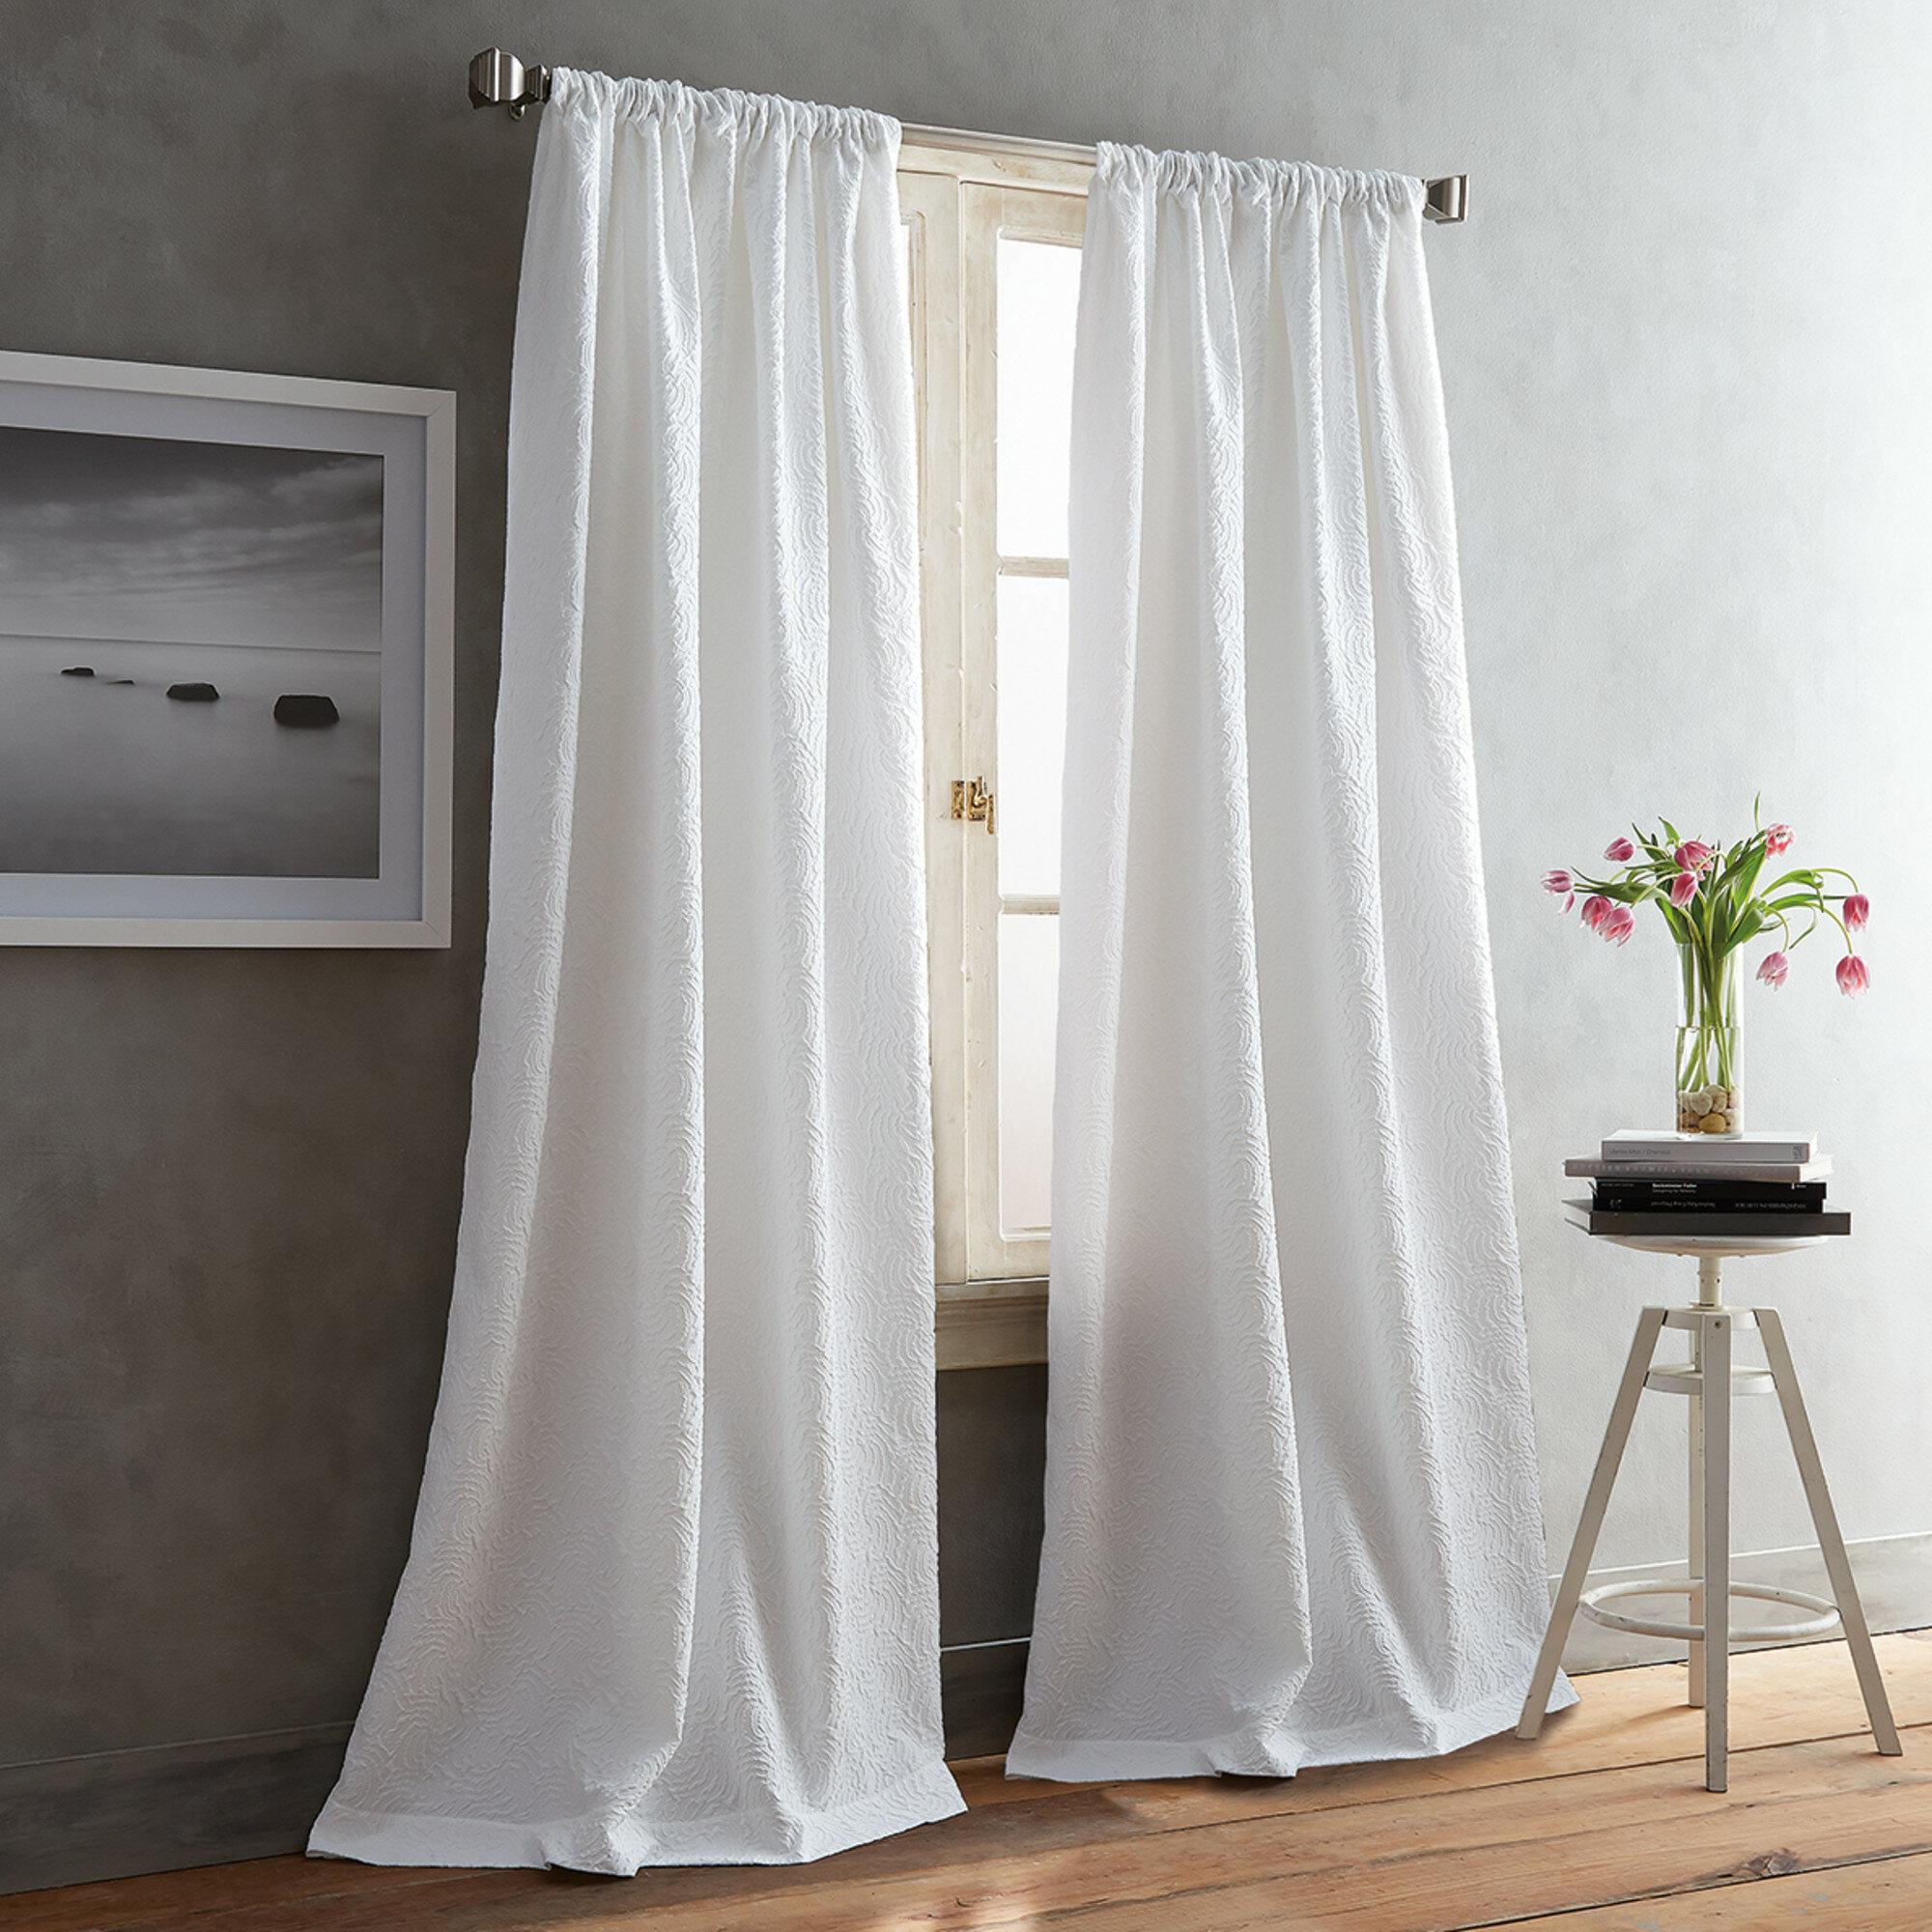 Dkny Cloud Solid Color Room Darkening Rod Pocket Curtain Panels Reviews Wayfair